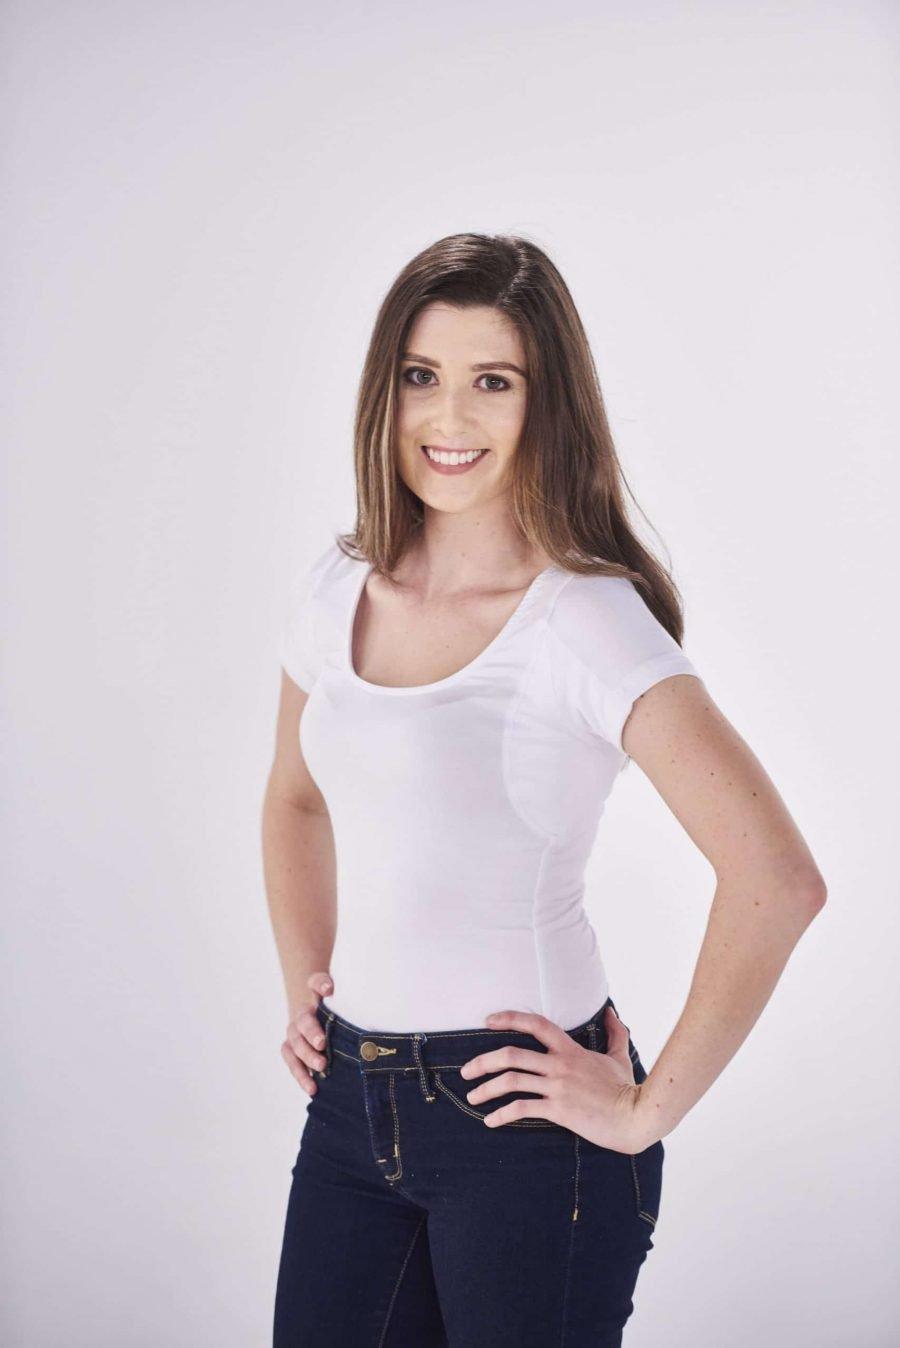 The TopDry Sweatproof Women Scoop Neck Undershirt White